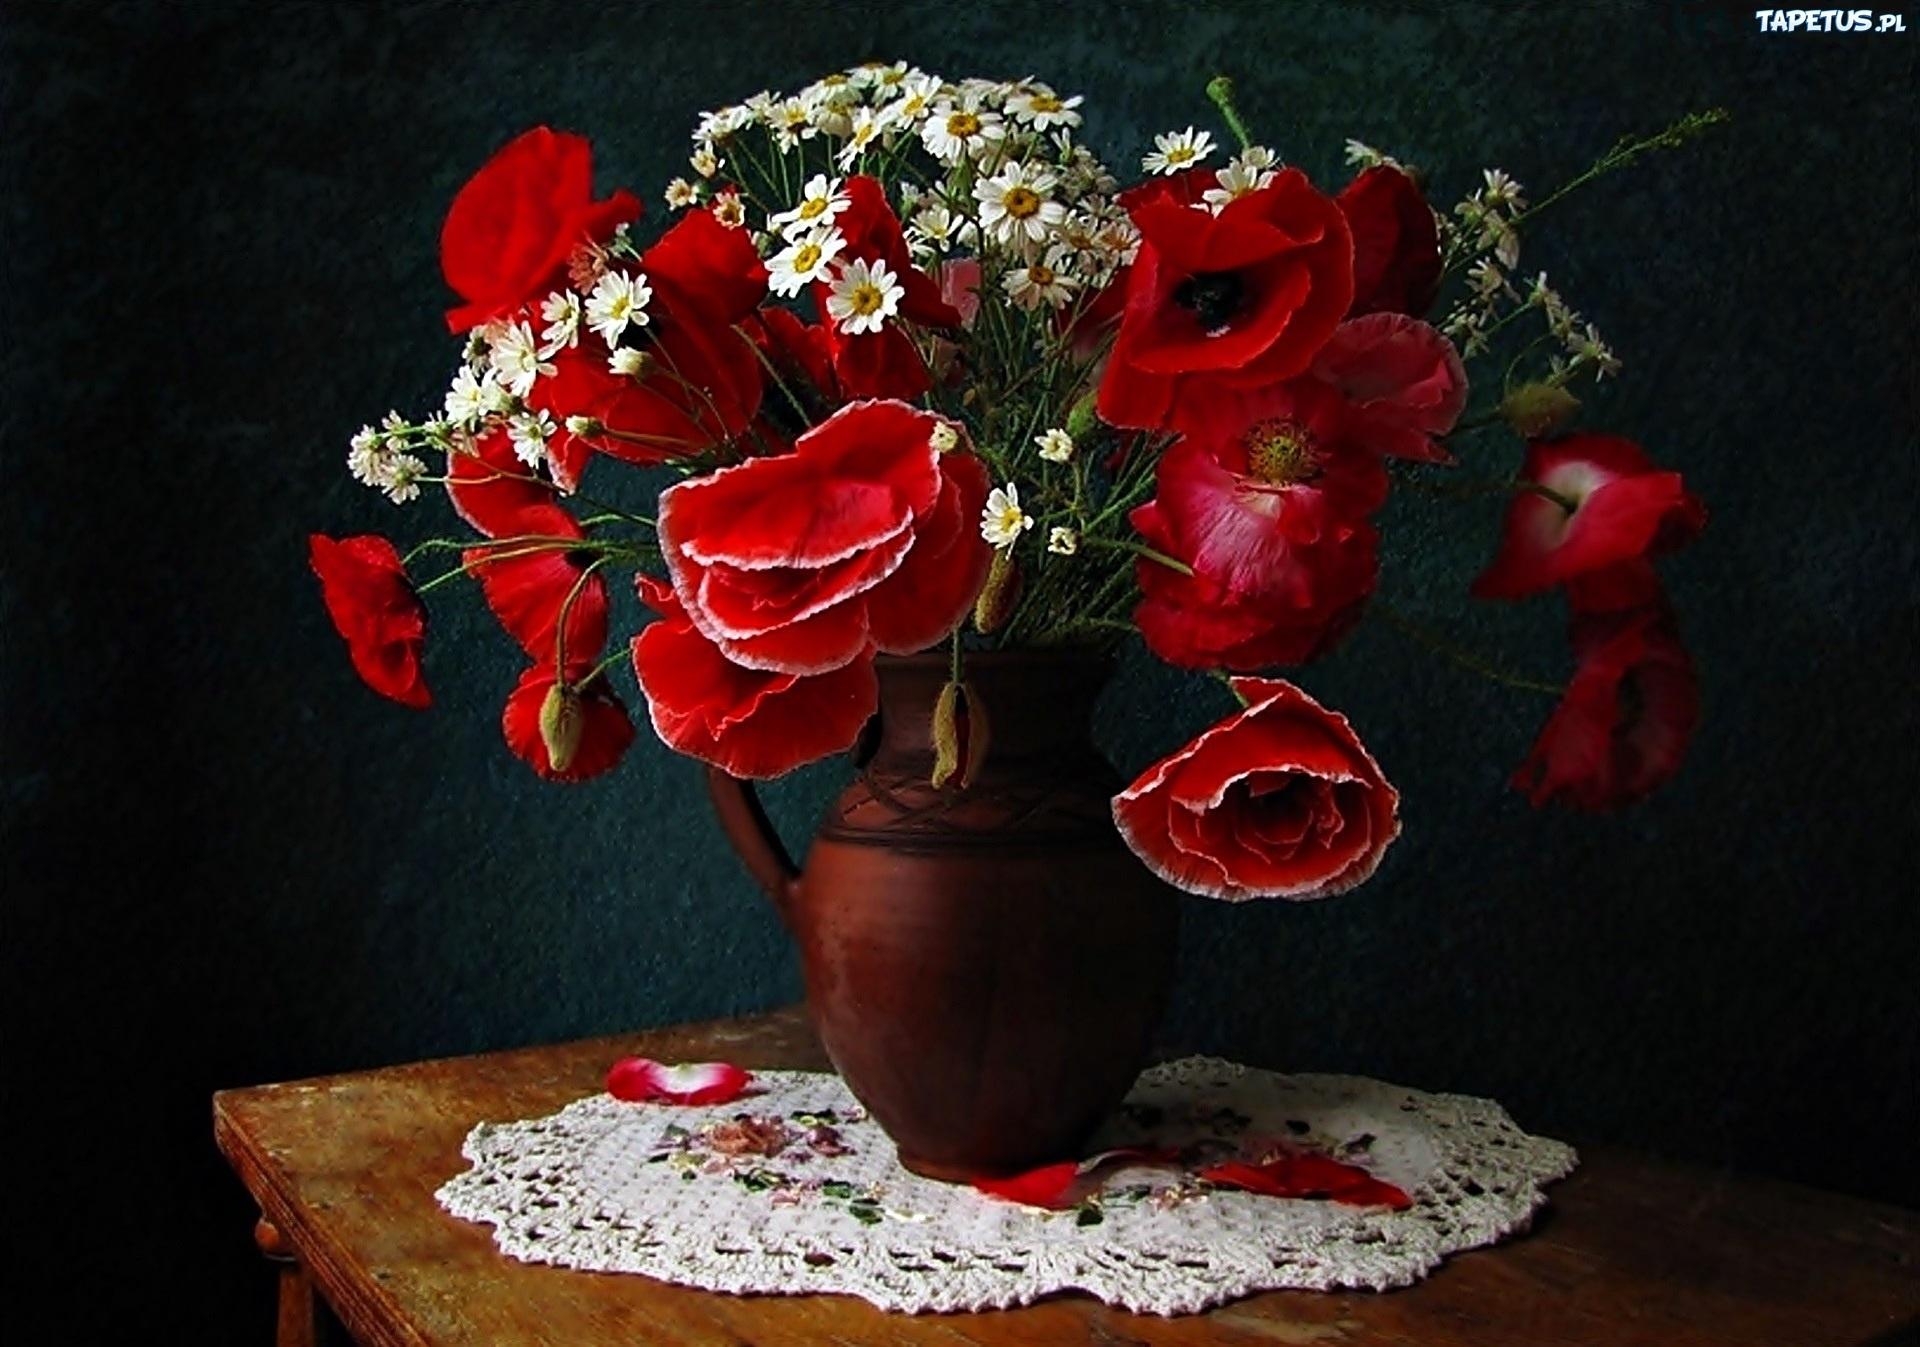 Натюрморт с букетом цветов фото